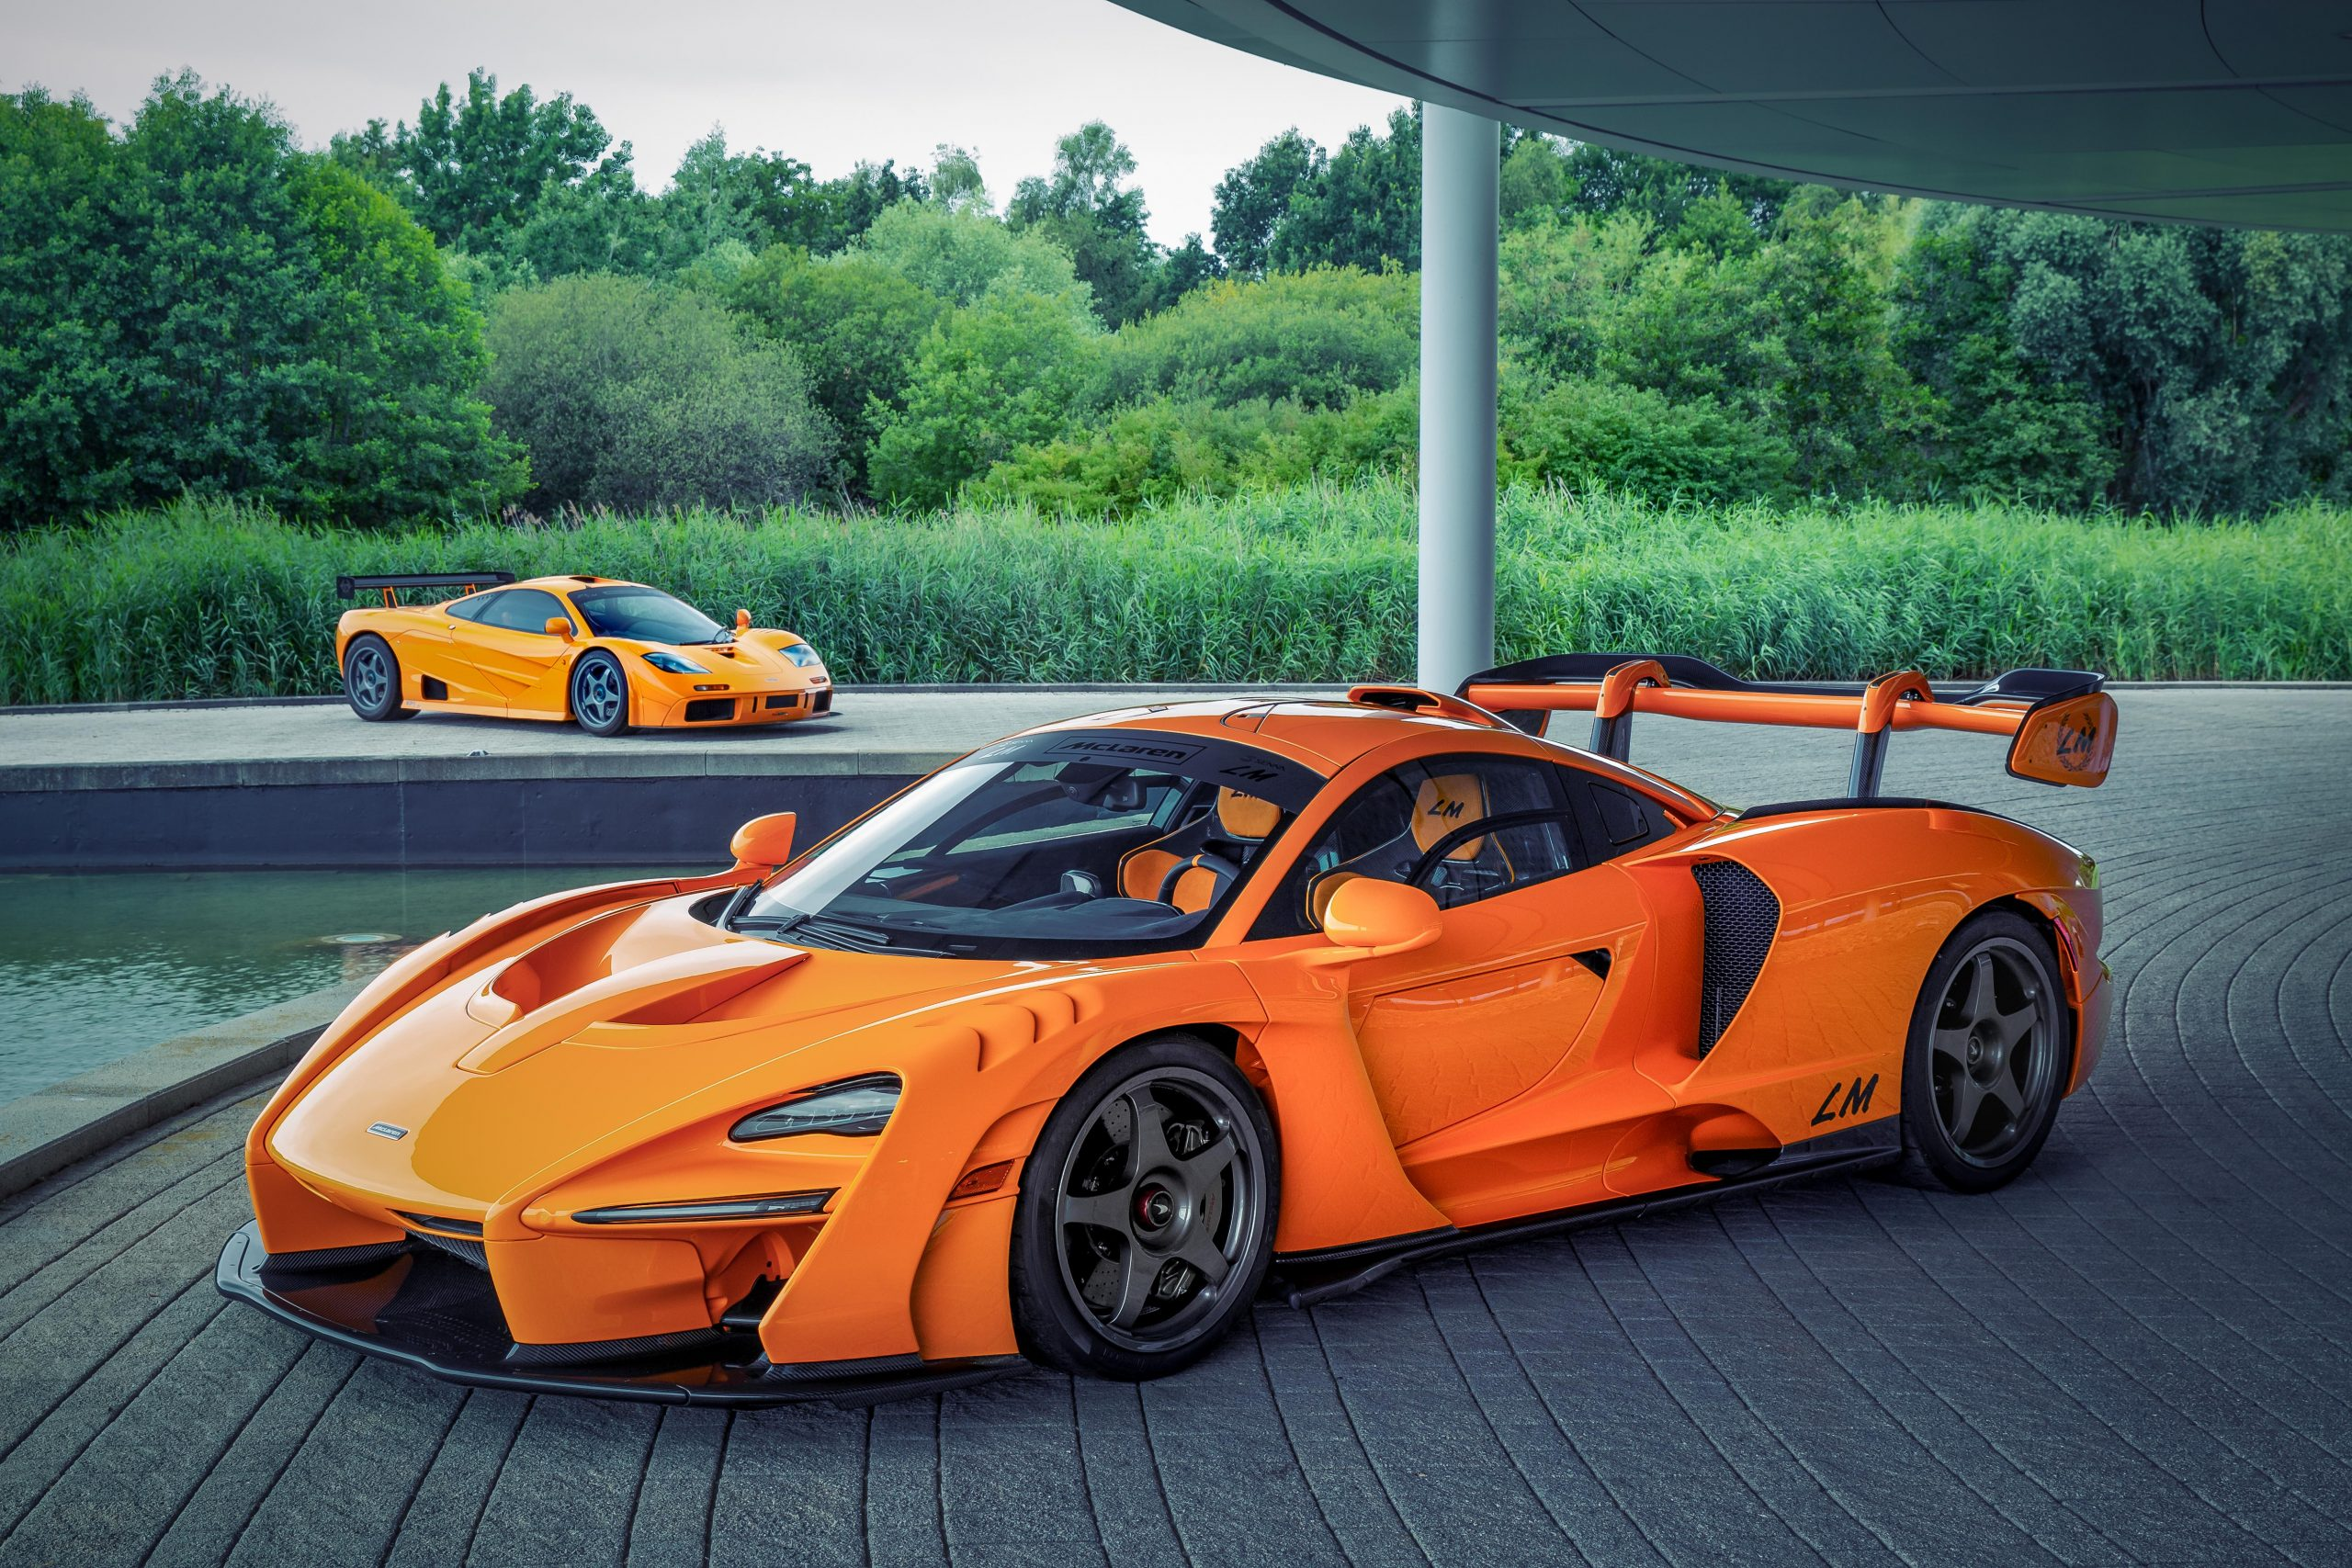 2020 McLaren Senna LM